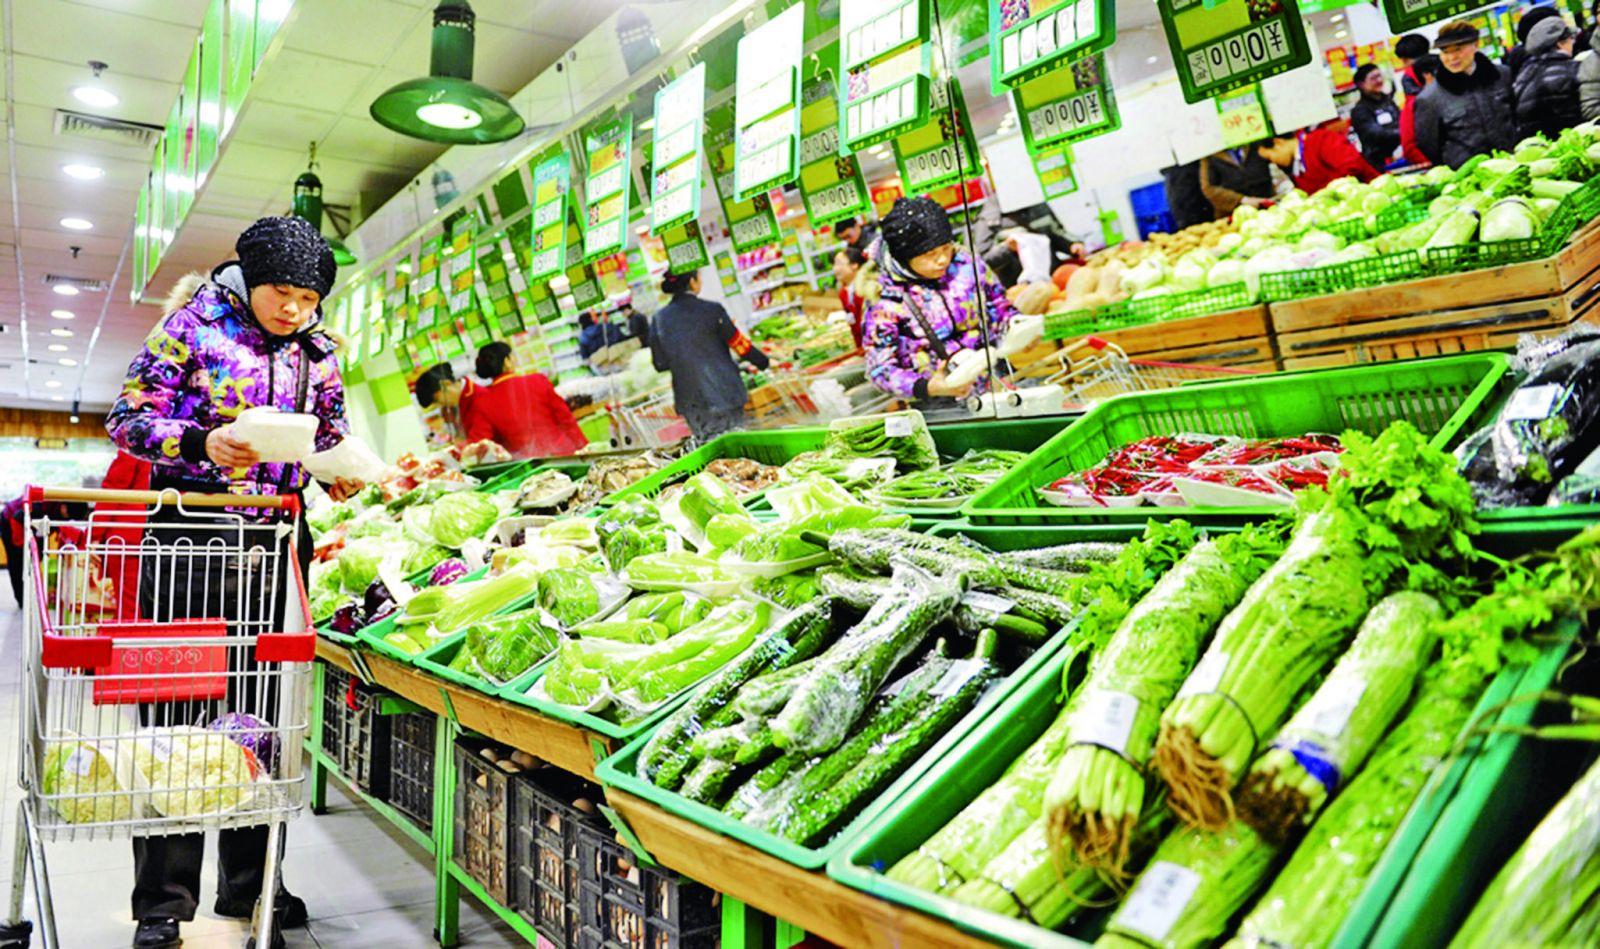 食品價格14年首跌